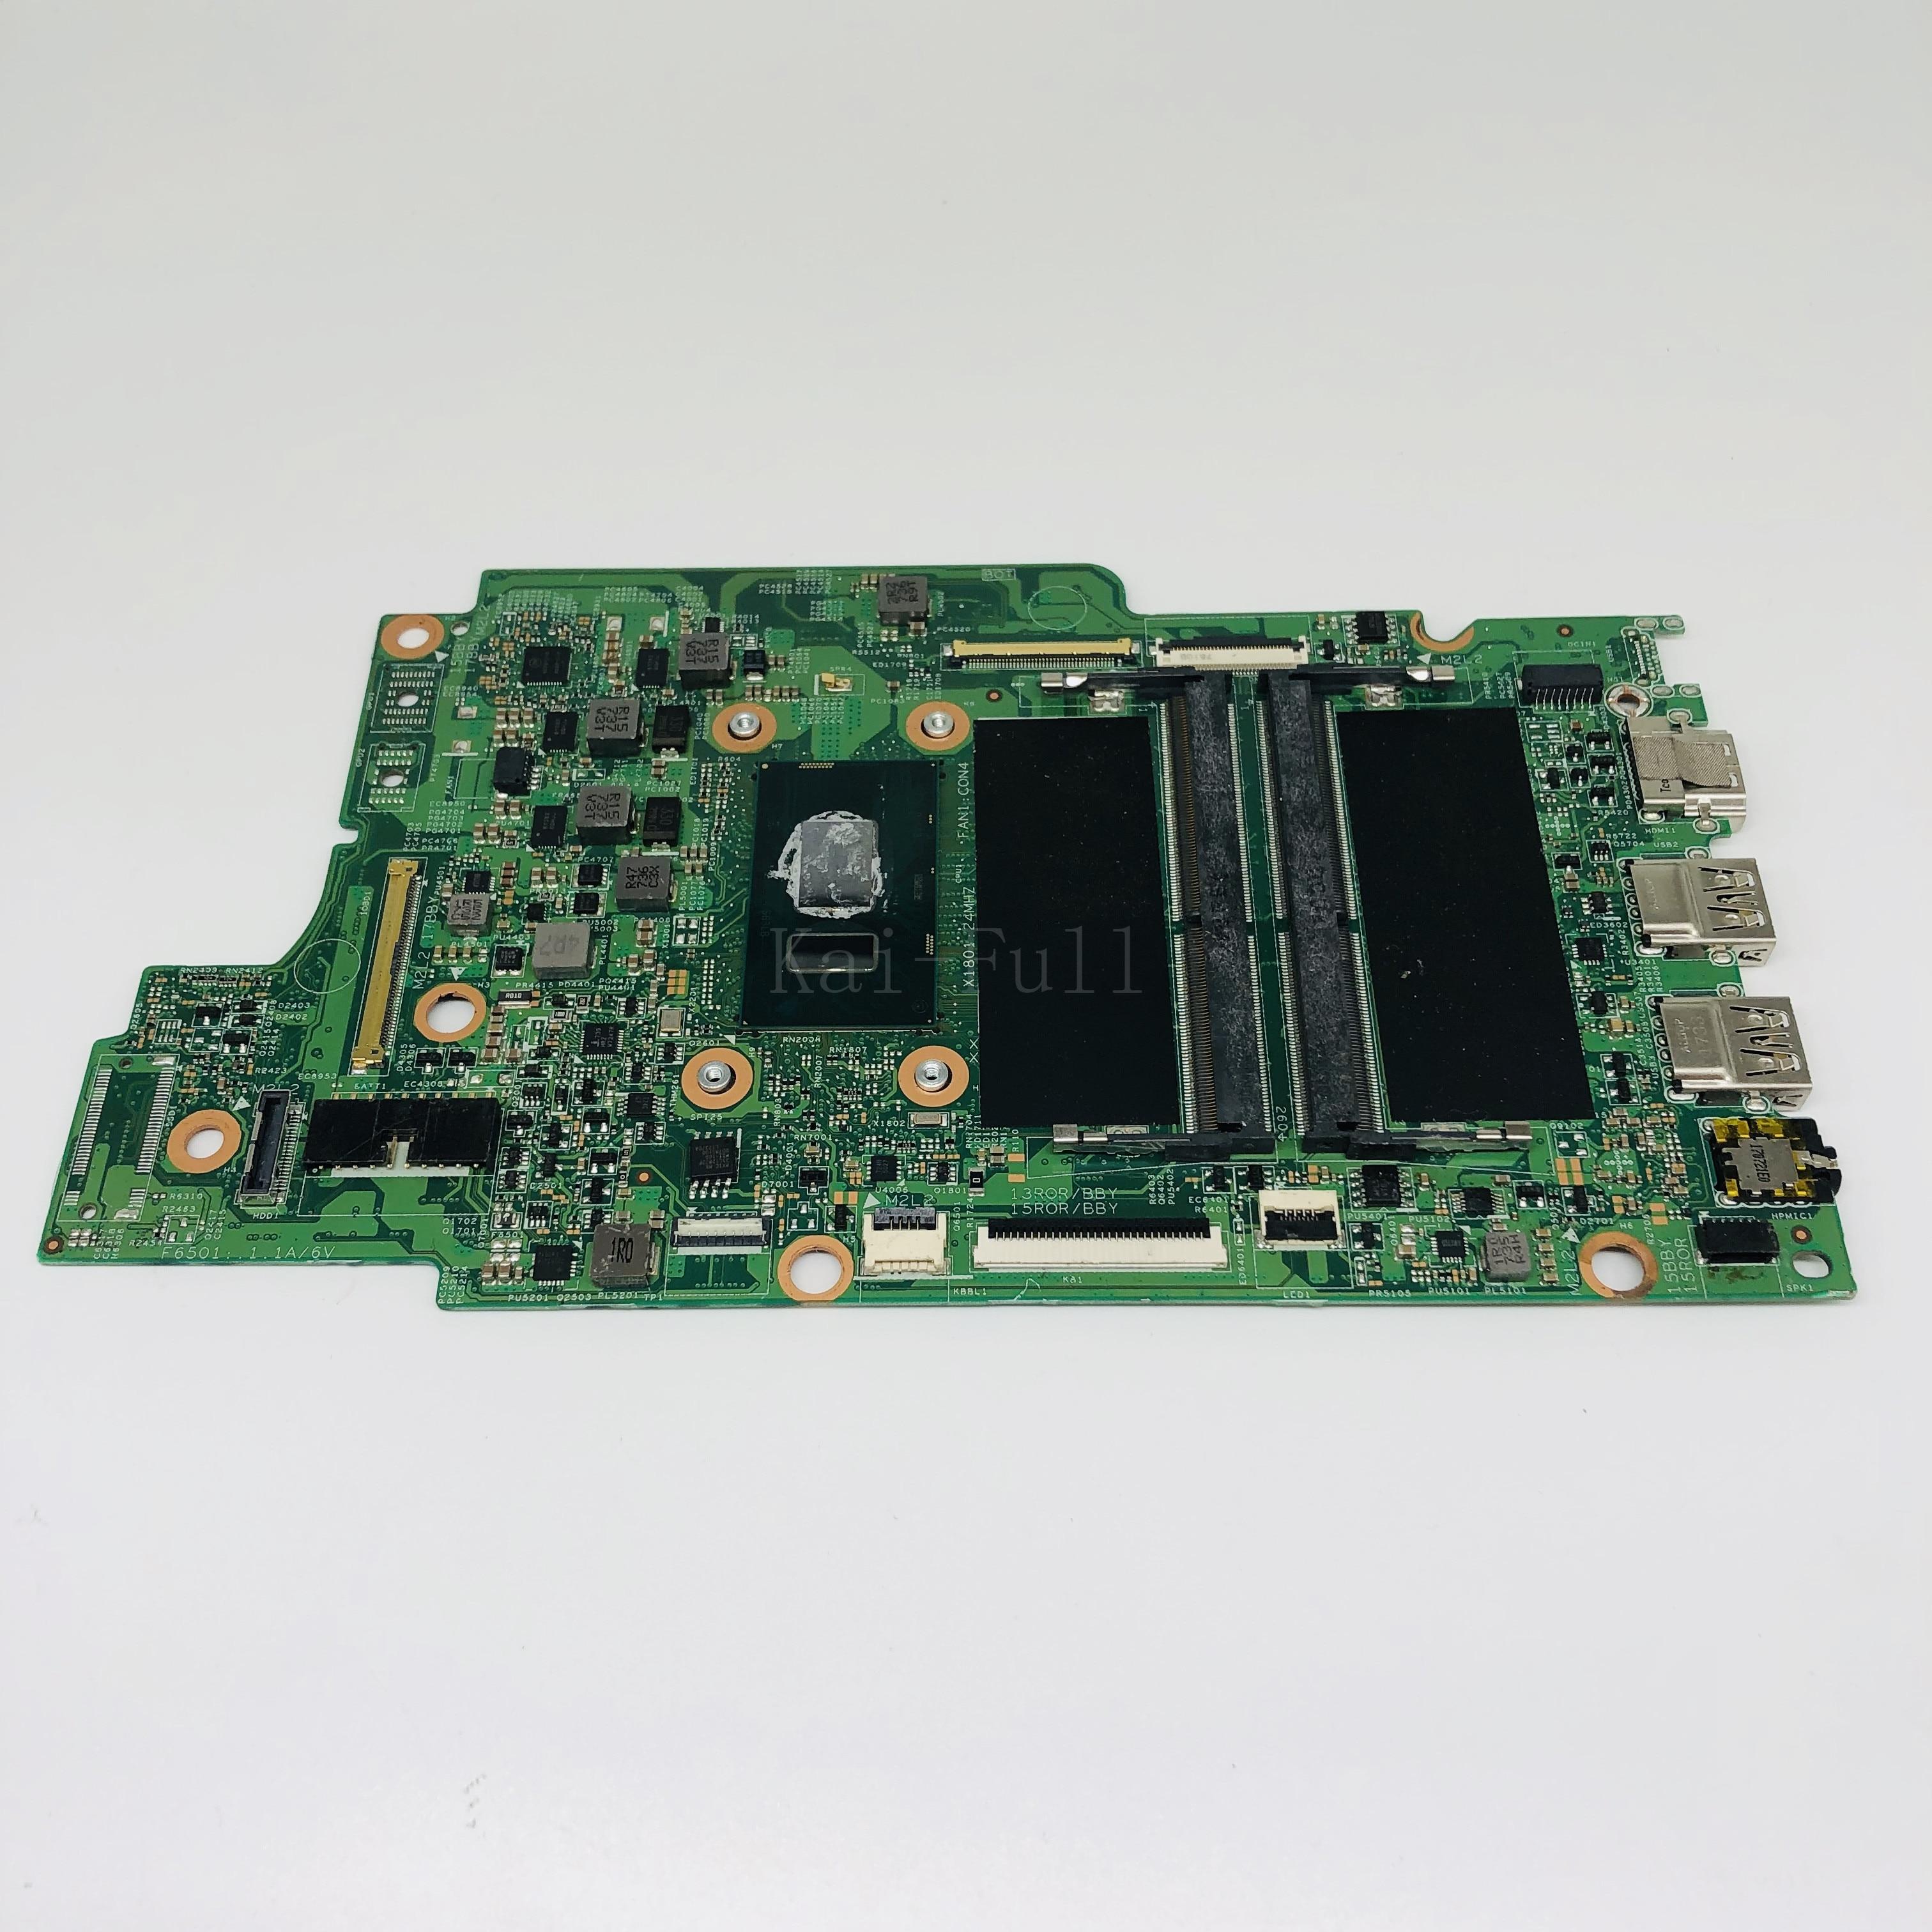 Placa base para ordenador portátil DELL Inspiron 5379 5579 placa base para ordenador portátil con I5-8250U CPU 0KJ0J 00KJ0J CN-00KJ0J DDR4